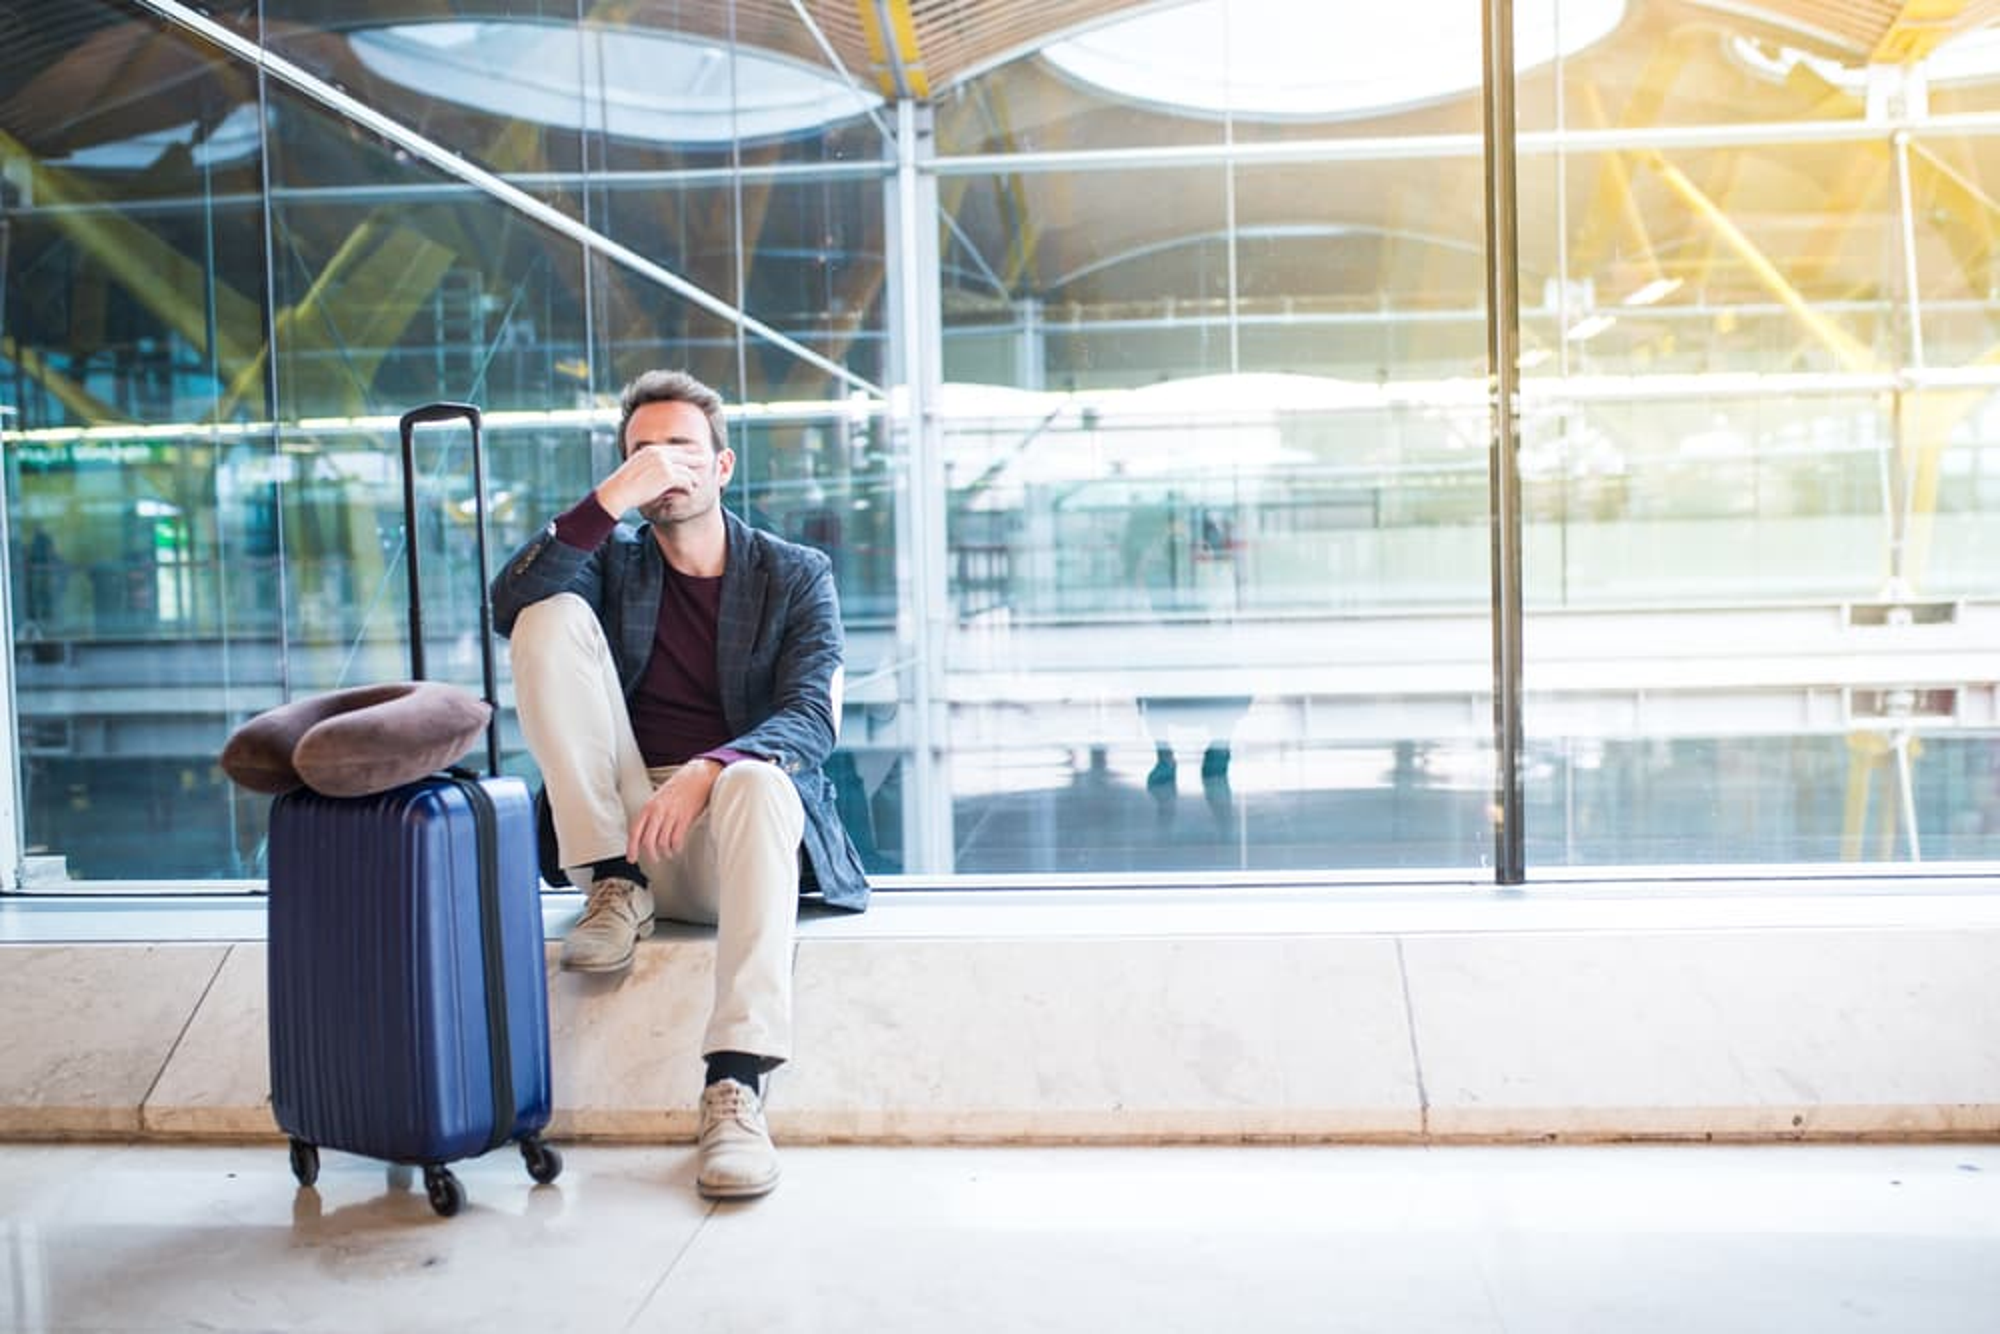 Annulation ou imprévu de voyage